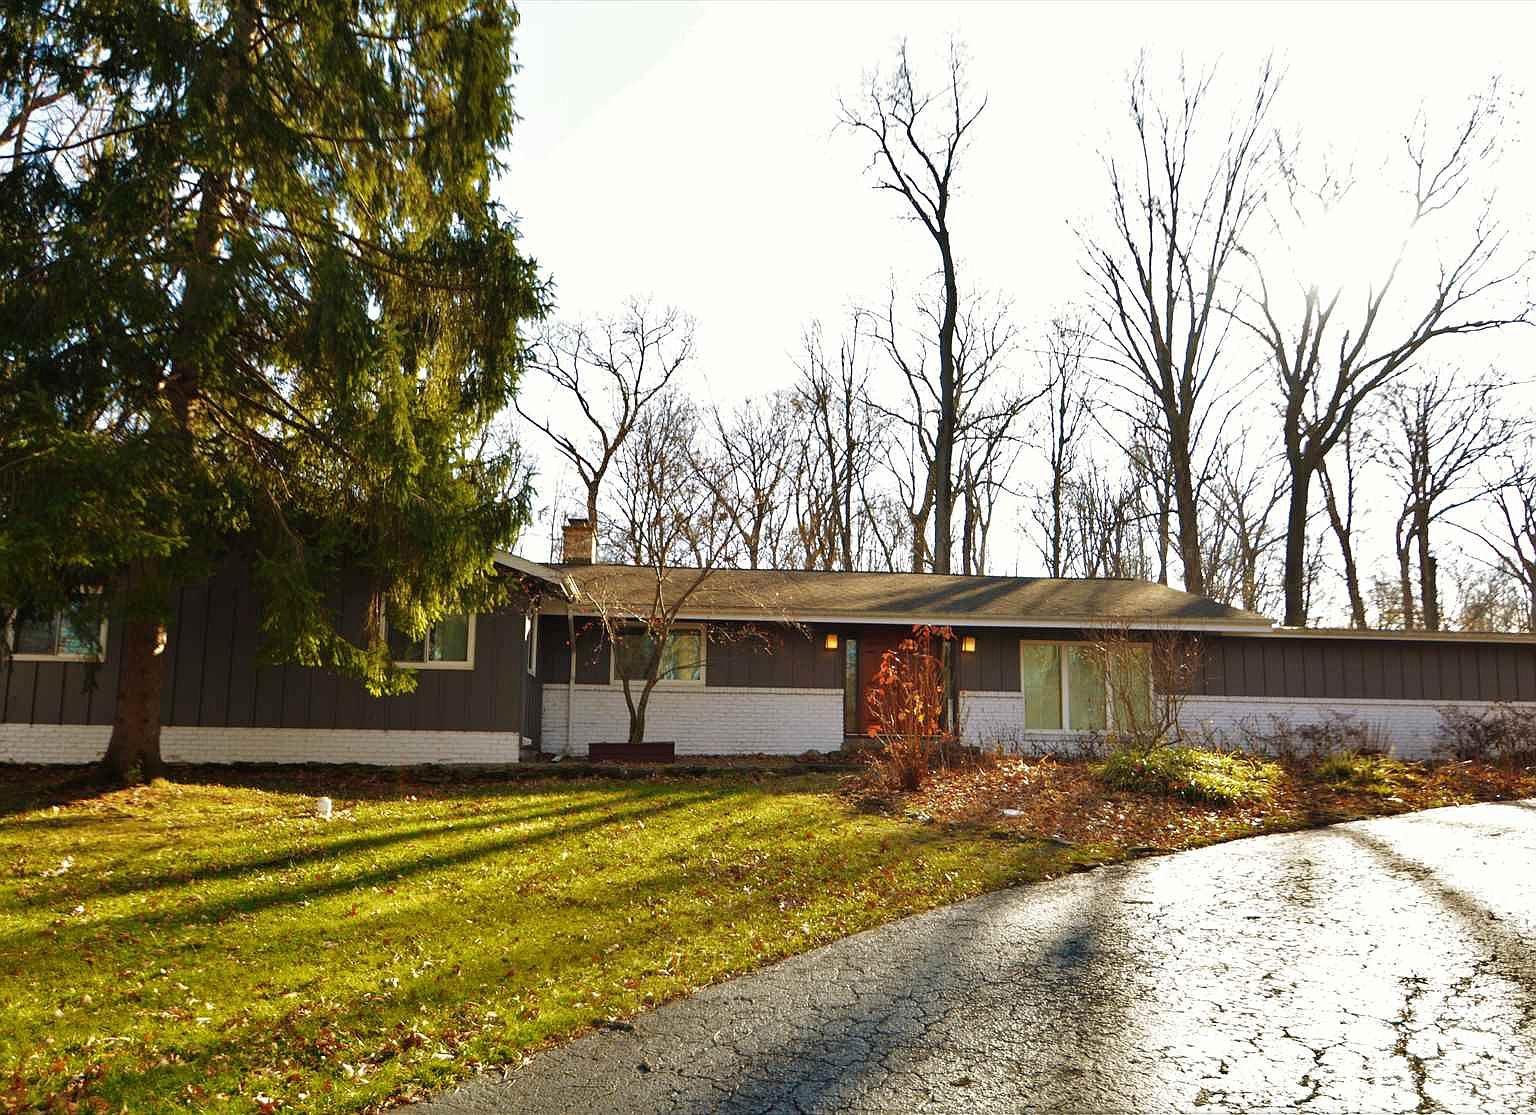 c300ba525d801e6d621ab8e609f3ddd6 cc ft 1536 - Tamera Gardens Apartments Fort Wayne Indiana